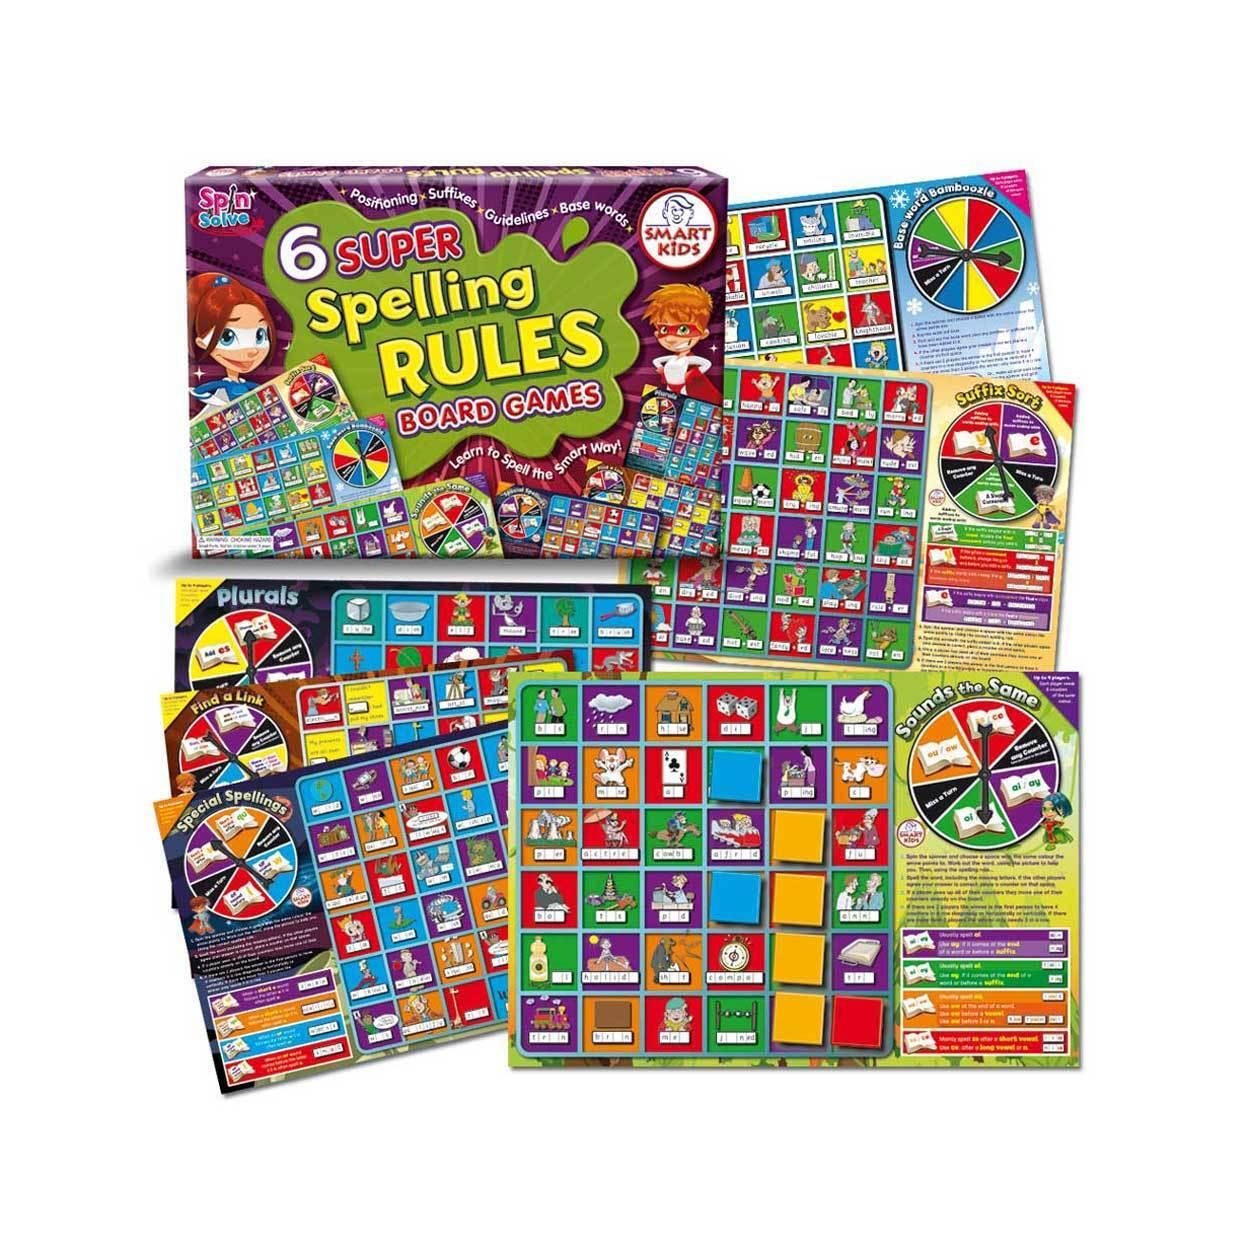 Smart Kids Six Super Spelling Rules Board Games